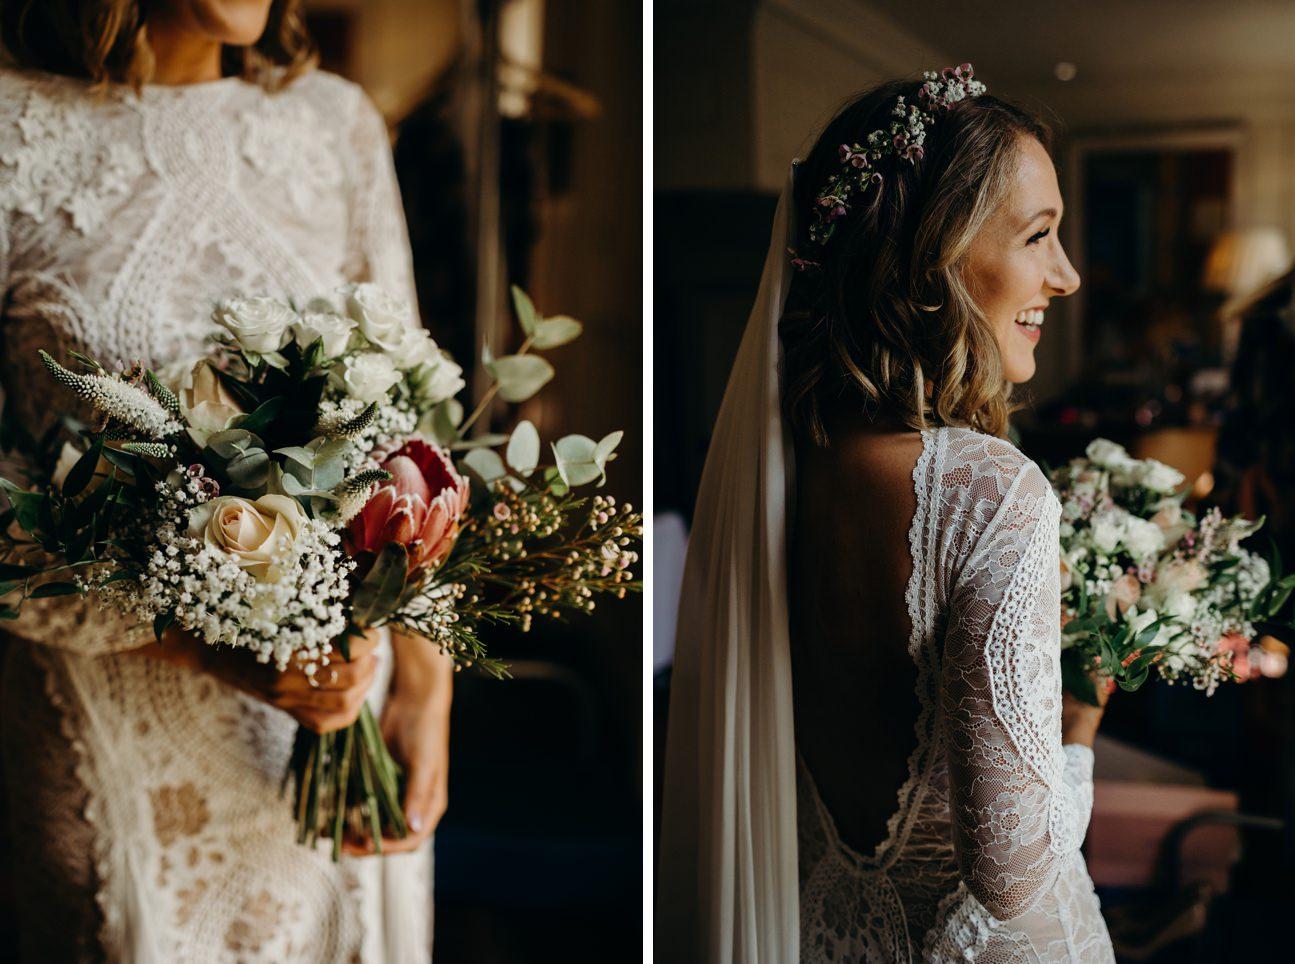 Hampshire Barn wedding in ibthorpe 031